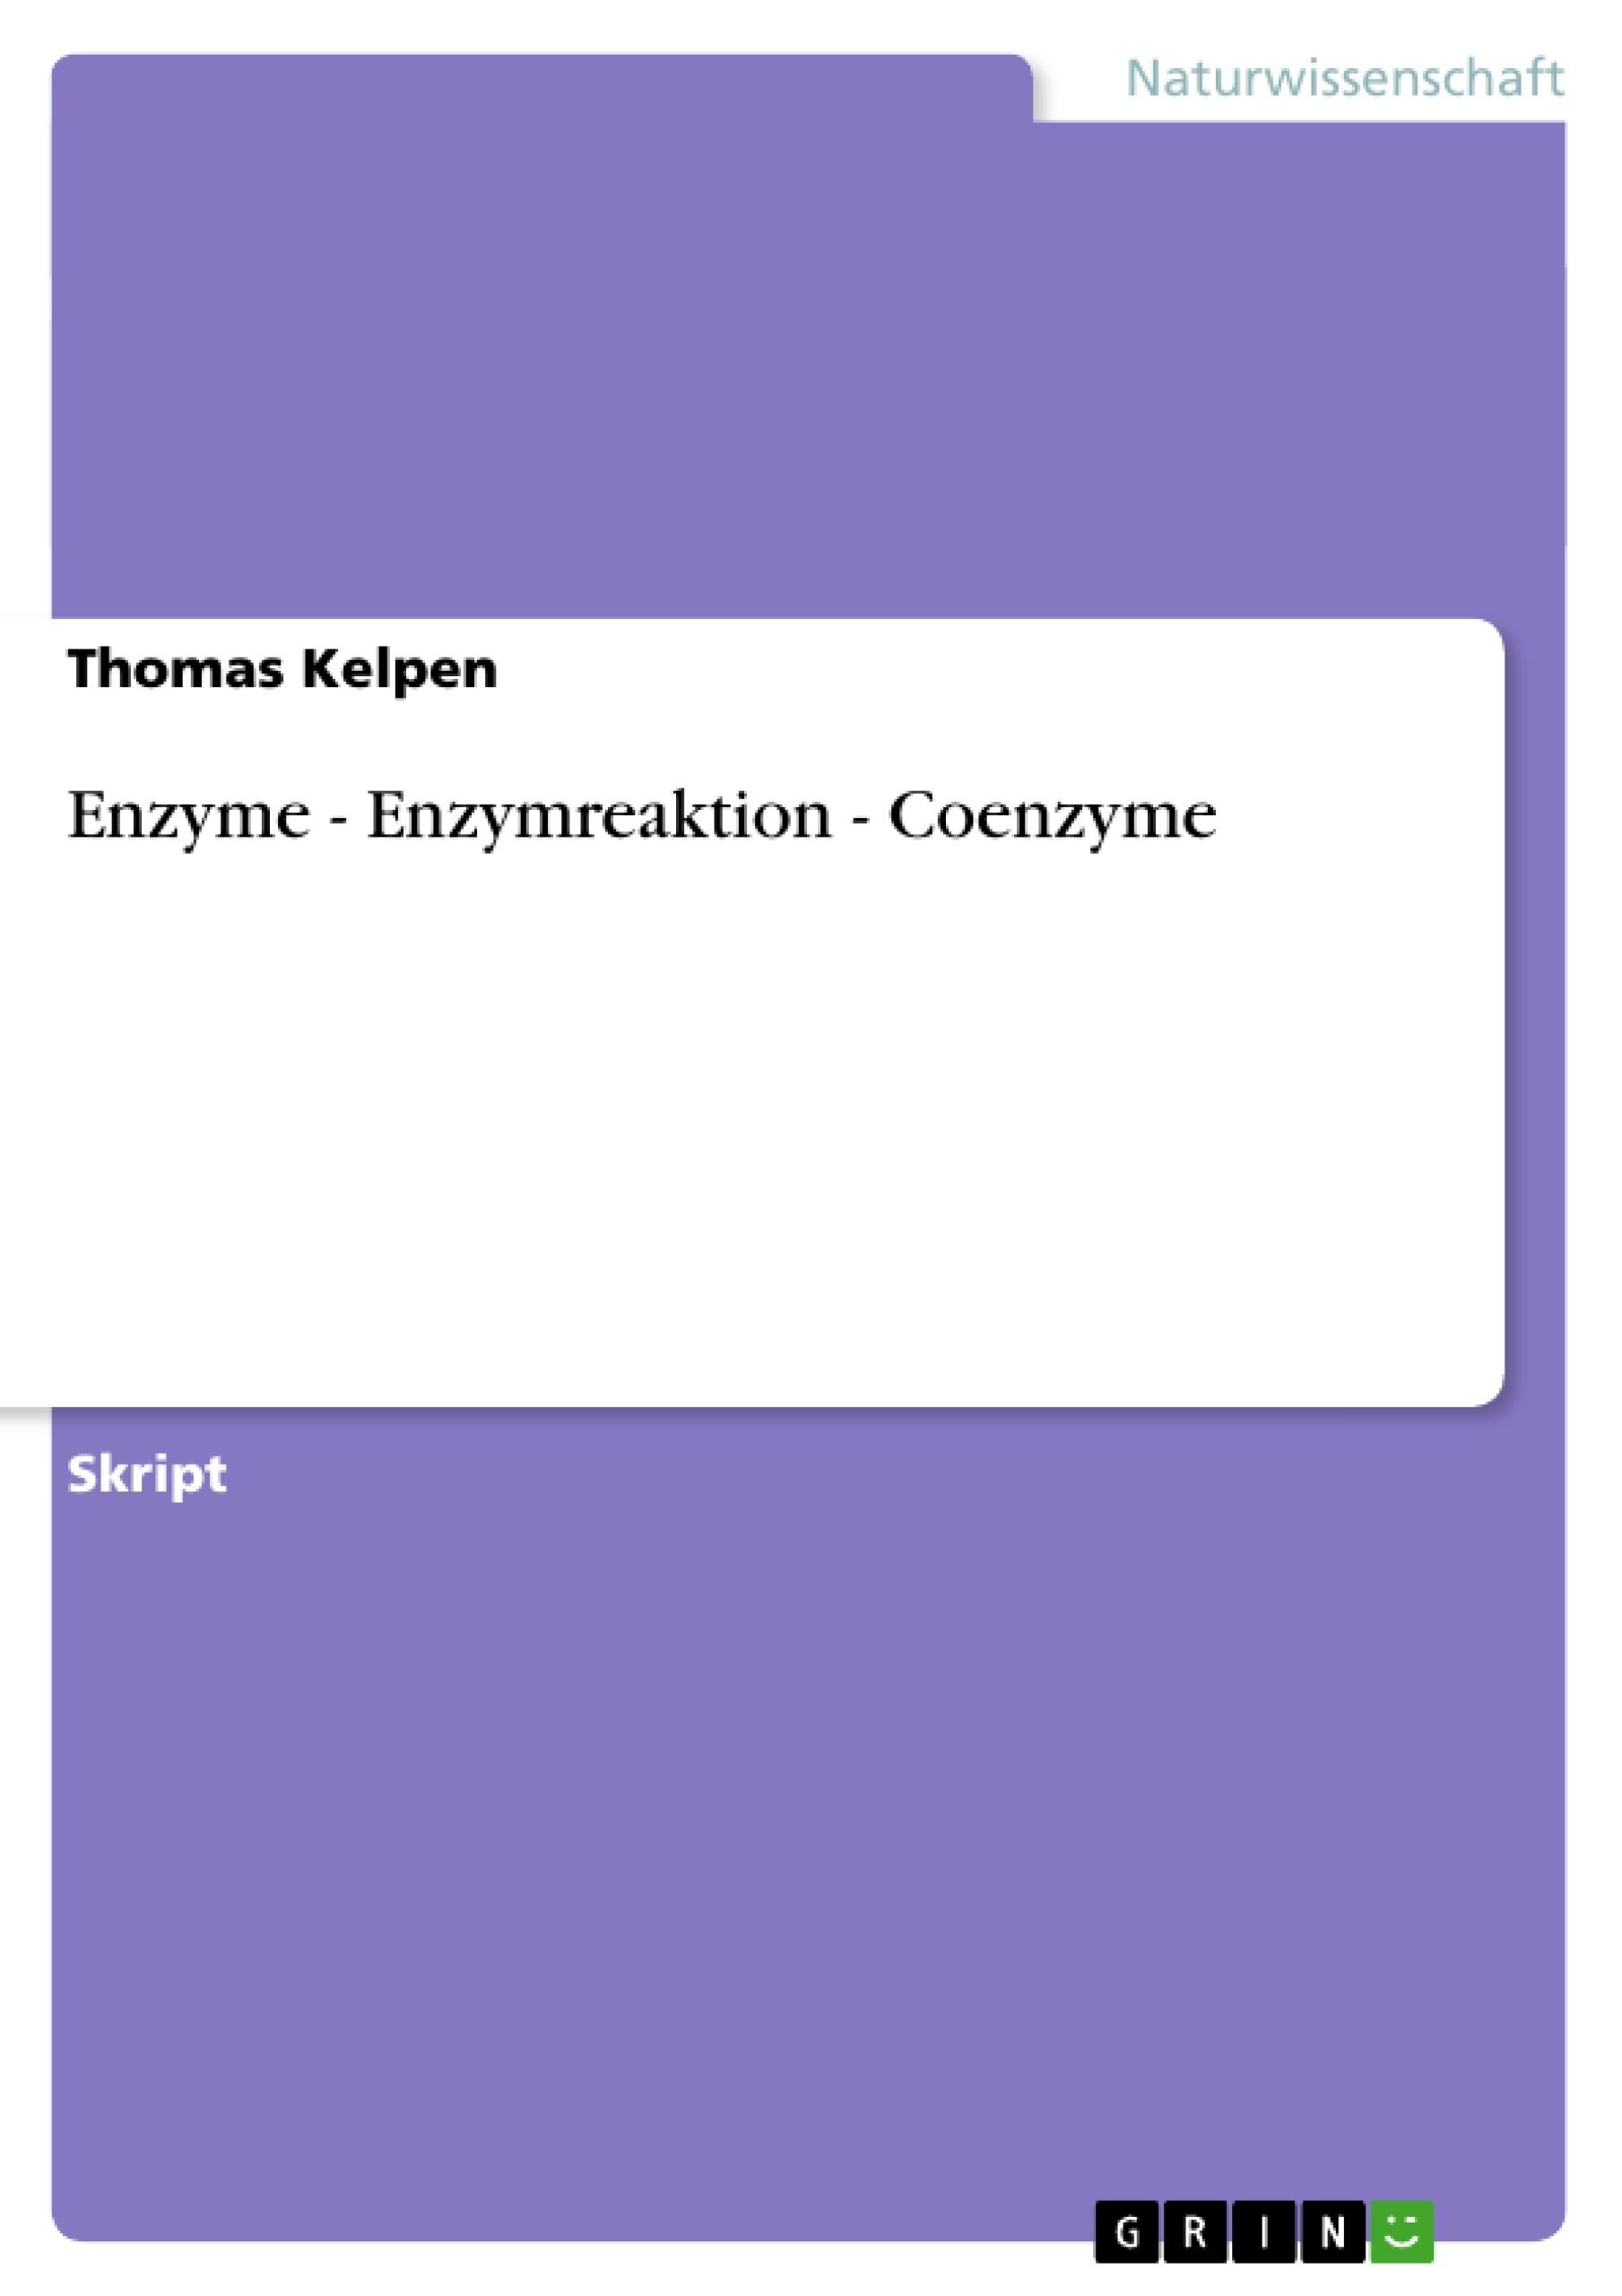 Titel: Enzyme - Enzymreaktion - Coenzyme